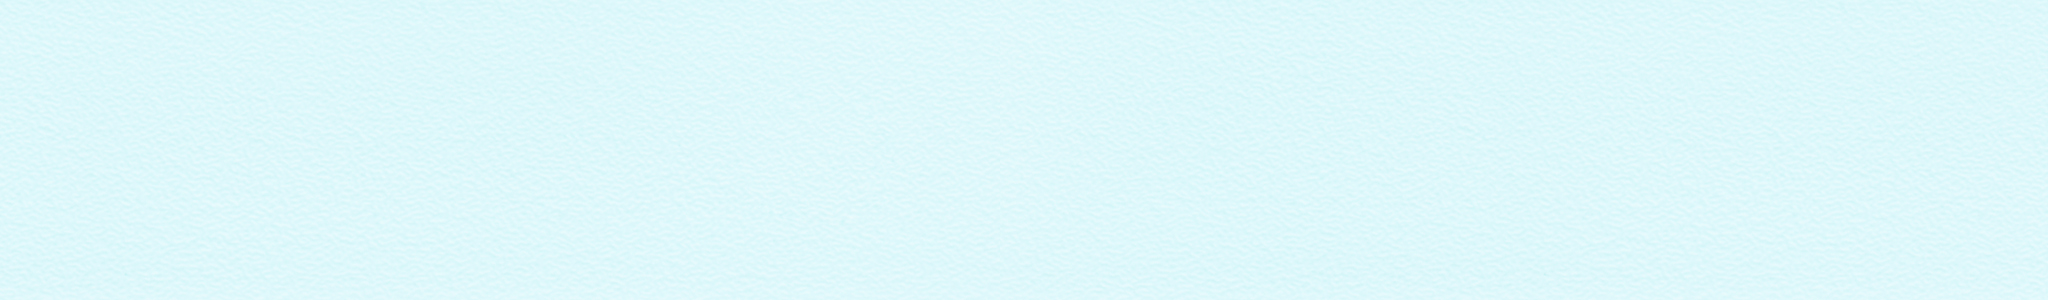 HU 15303 ABS Edge Light Blue Pearl 101